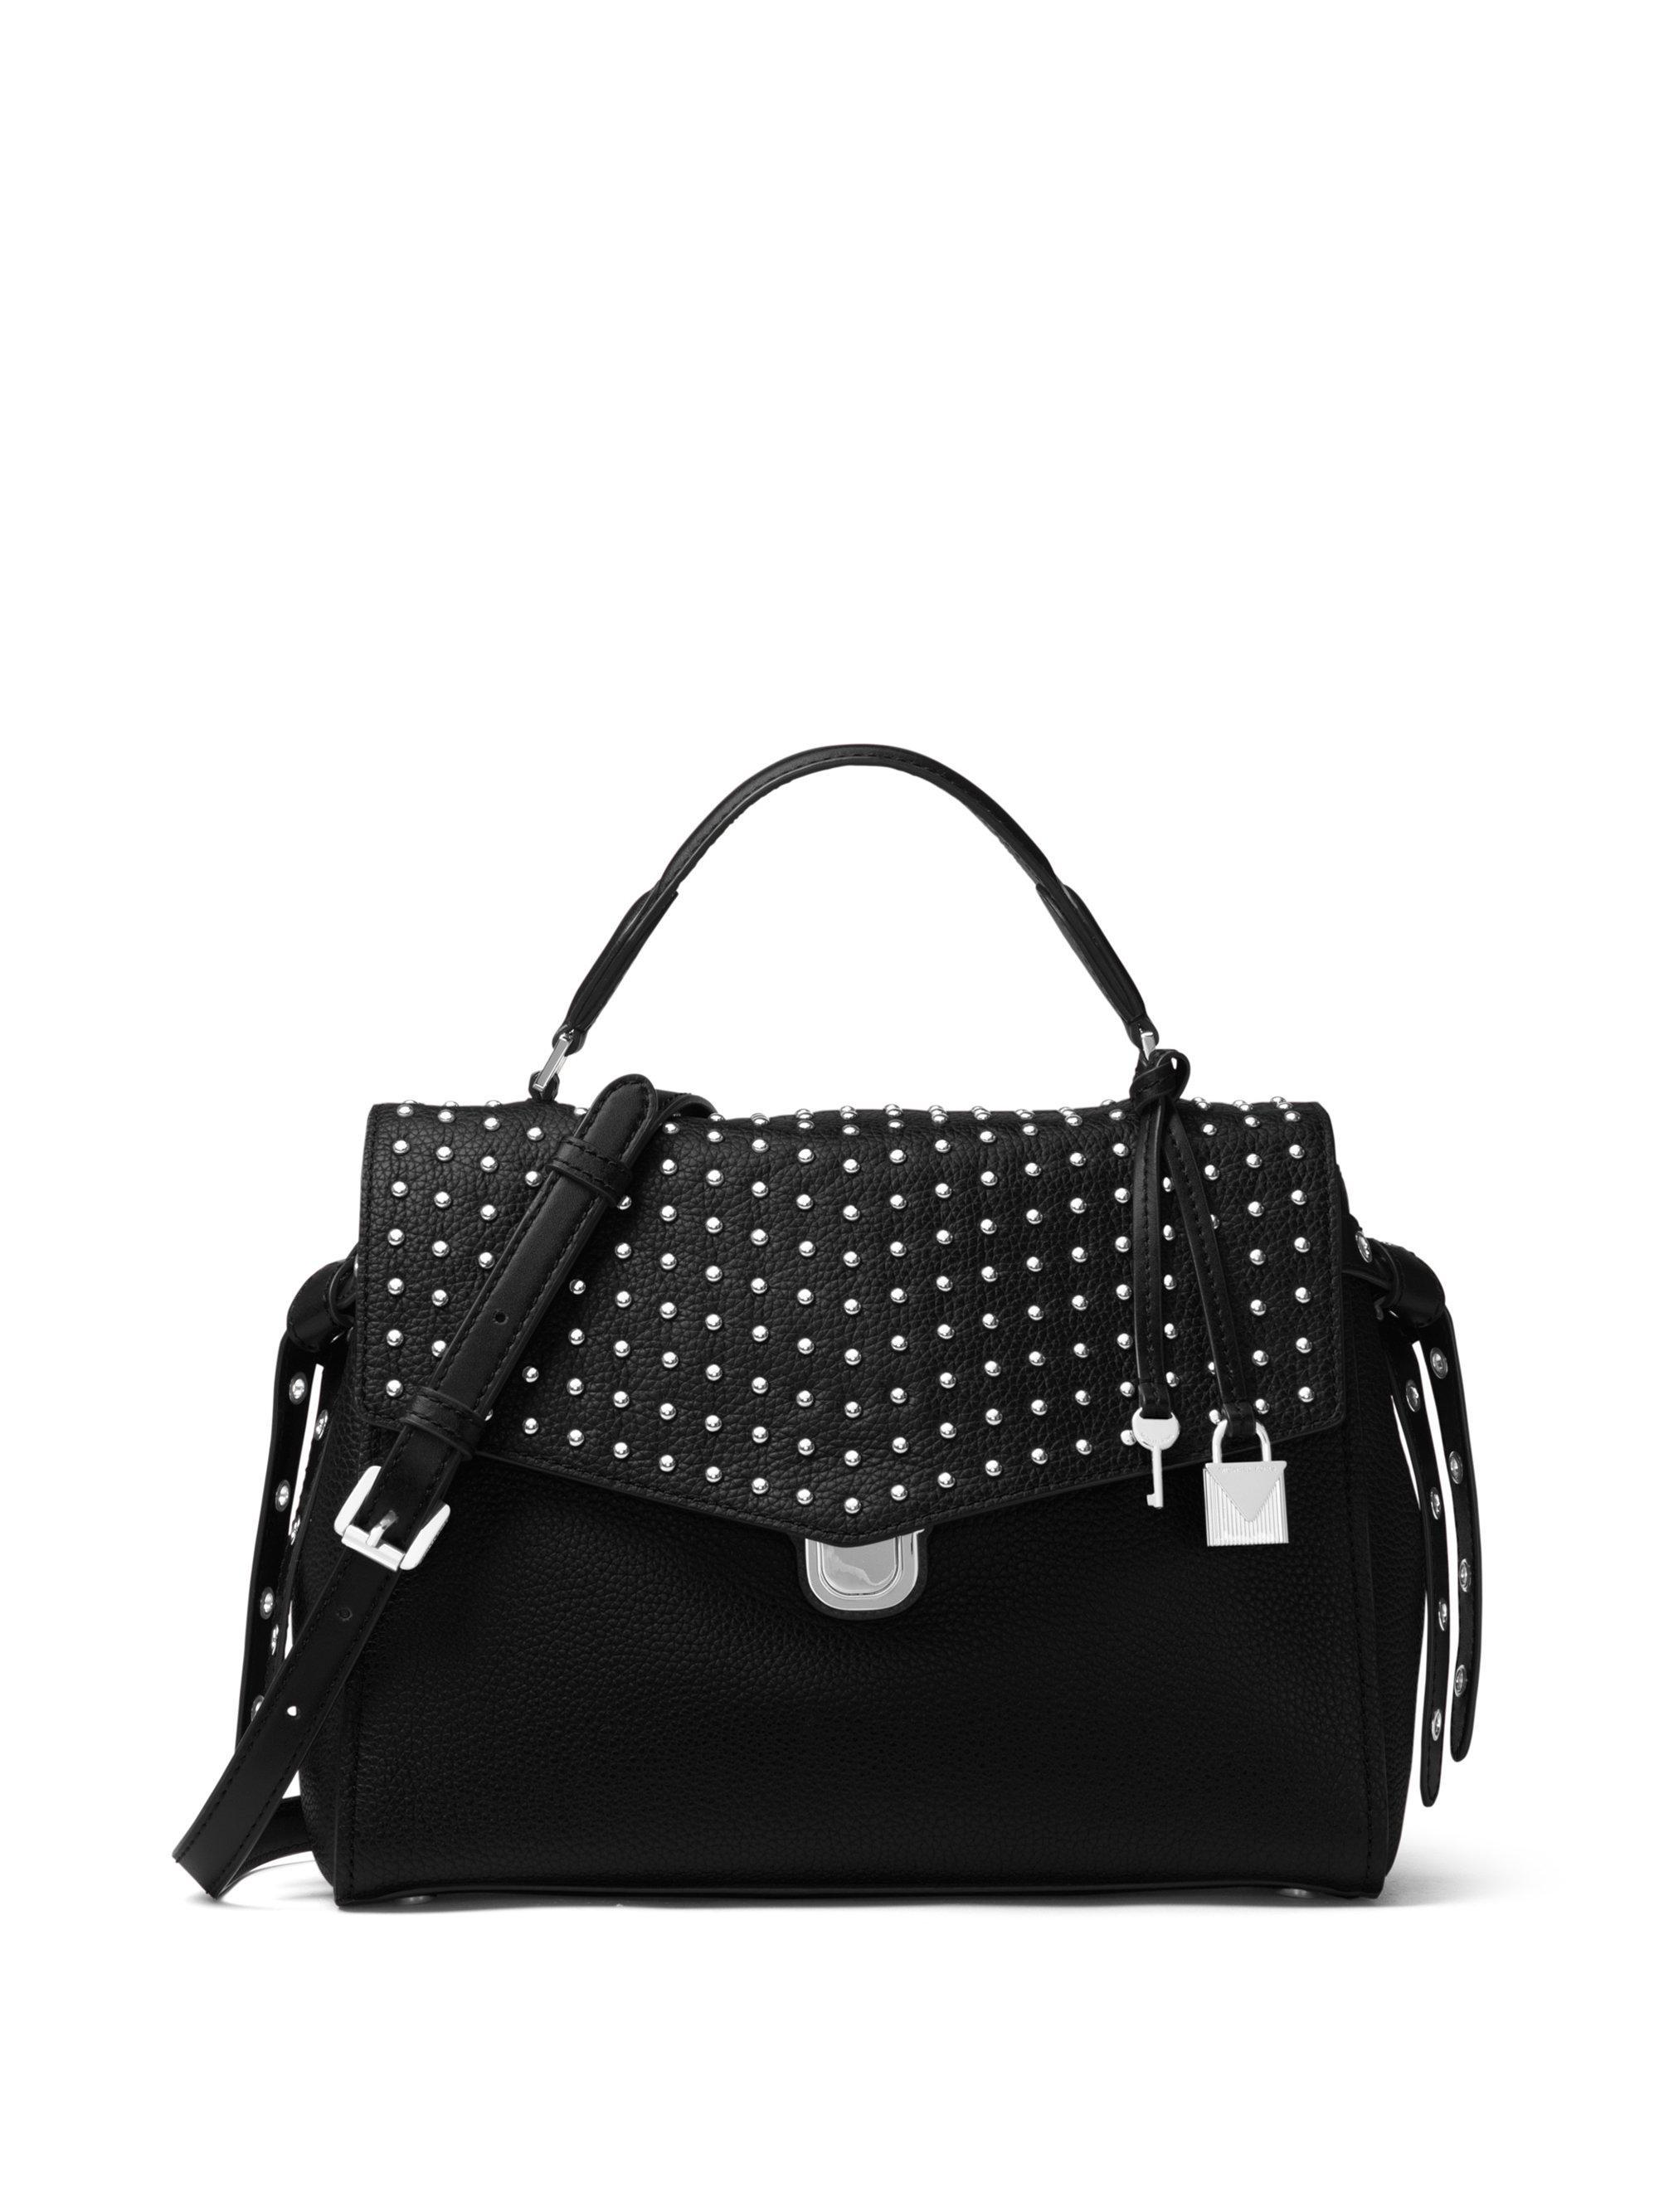 d11494b5c7fb ... netherlands shopping lyst michael michael kors bristol studded leather  satchel in black d5d97 a9d73 cd05b 0f7d1